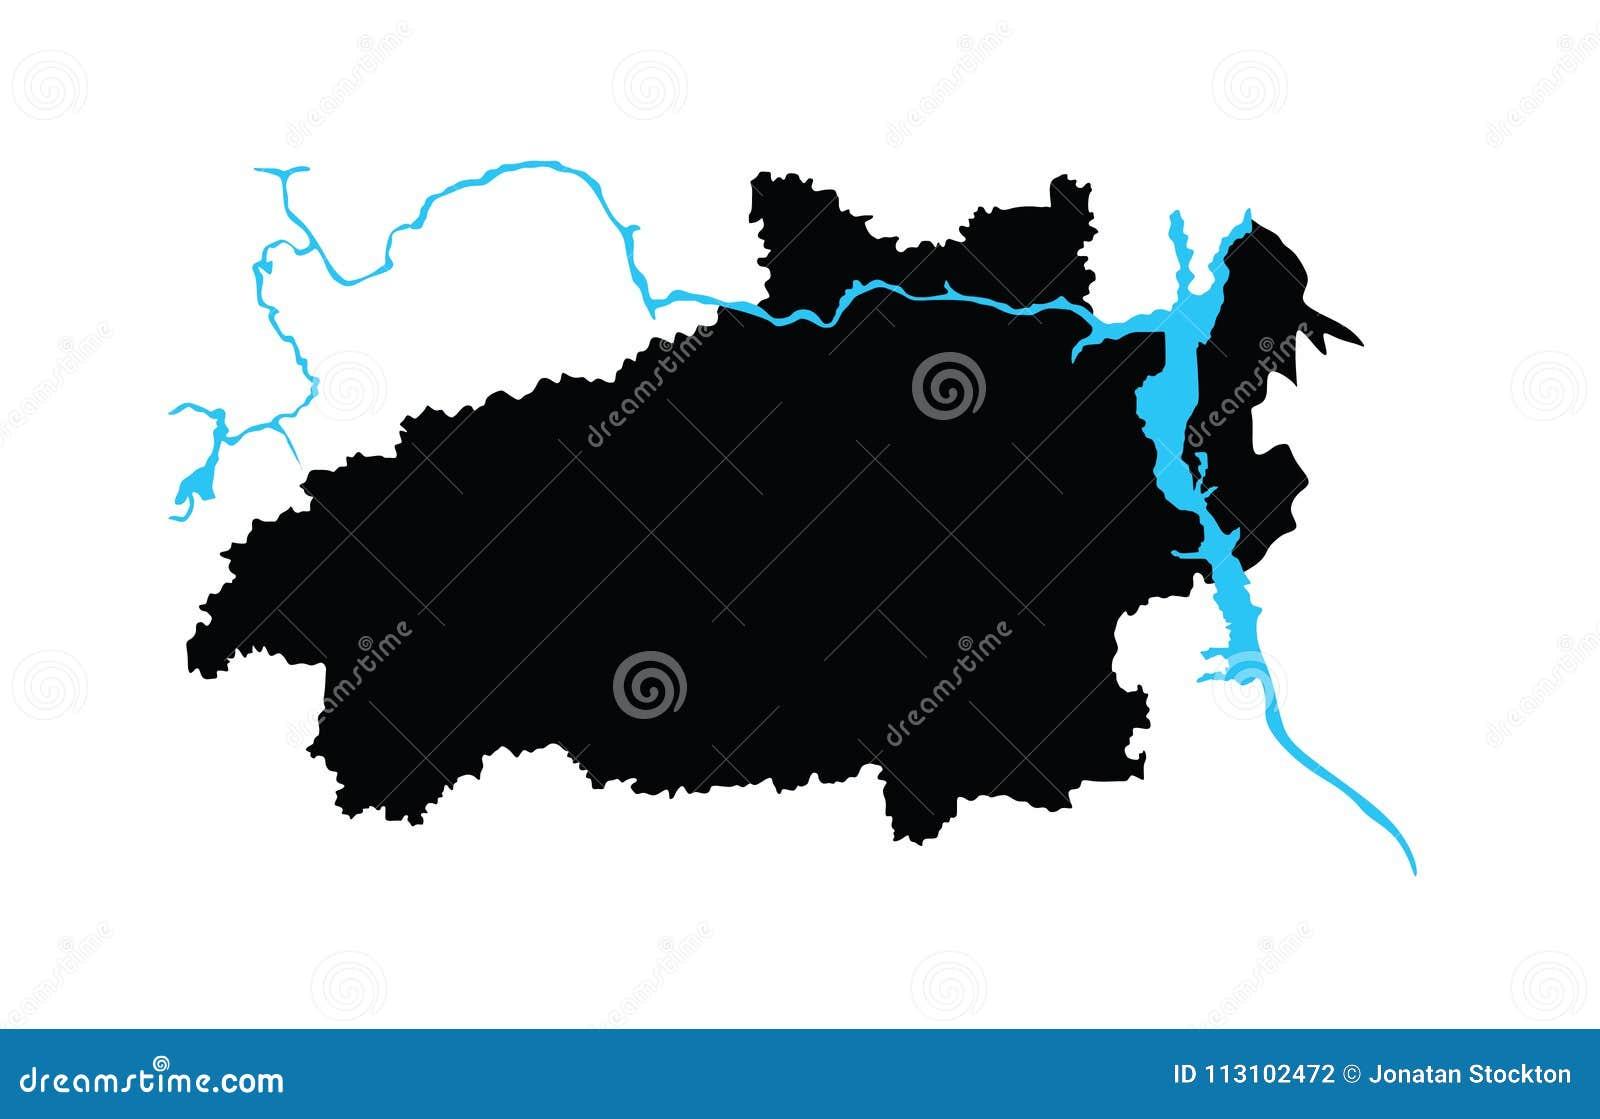 Ivanovskaya oblast russia